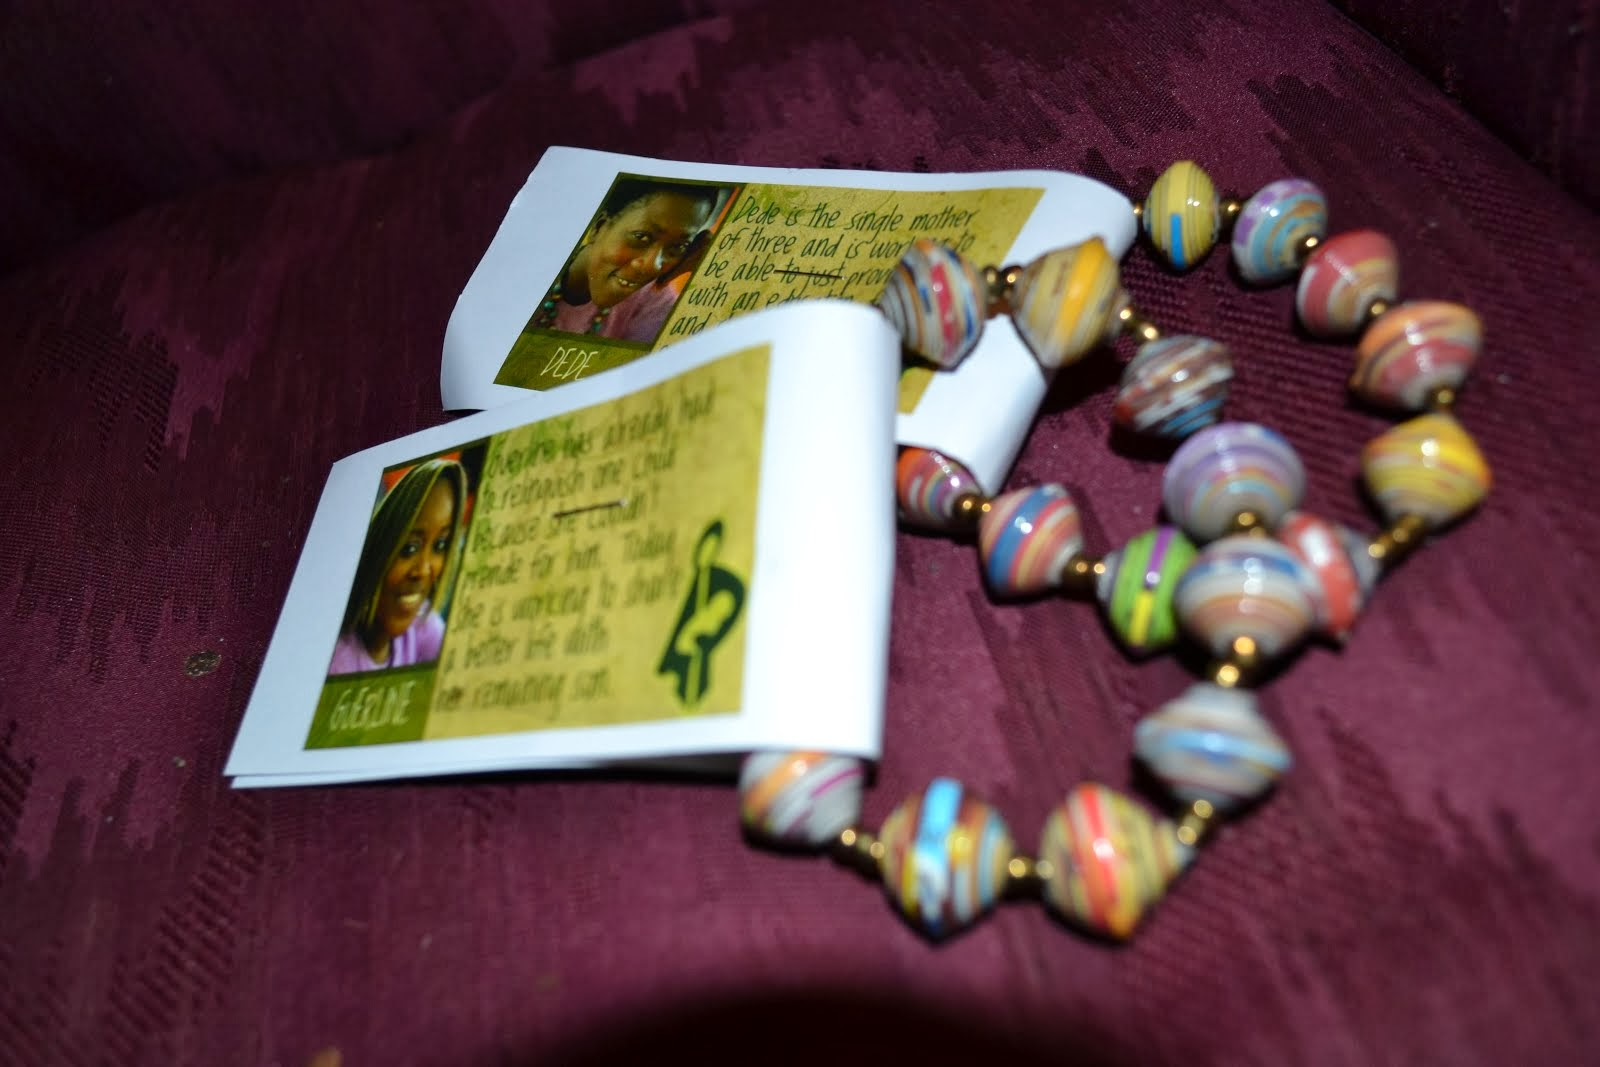 Selling bracelets for $8